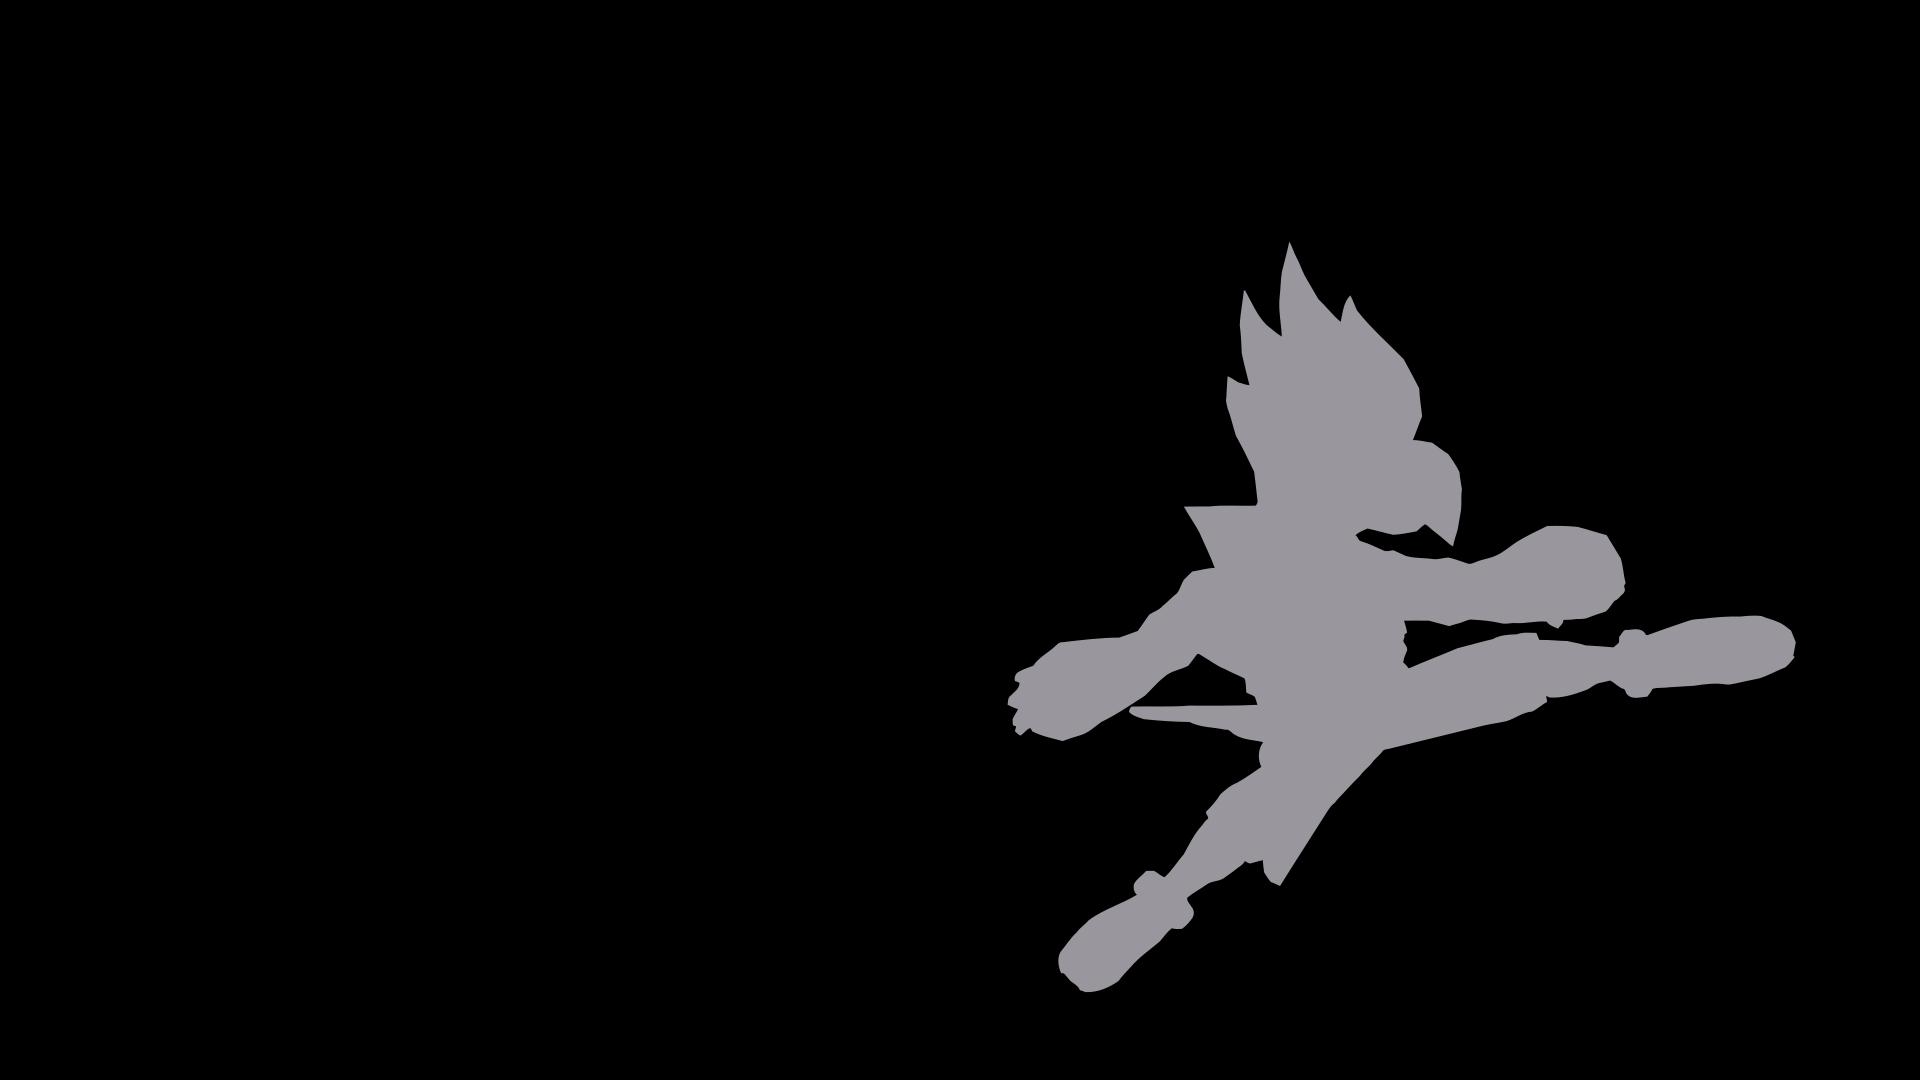 Falco B Air Wallpaper By Kuroppoisu